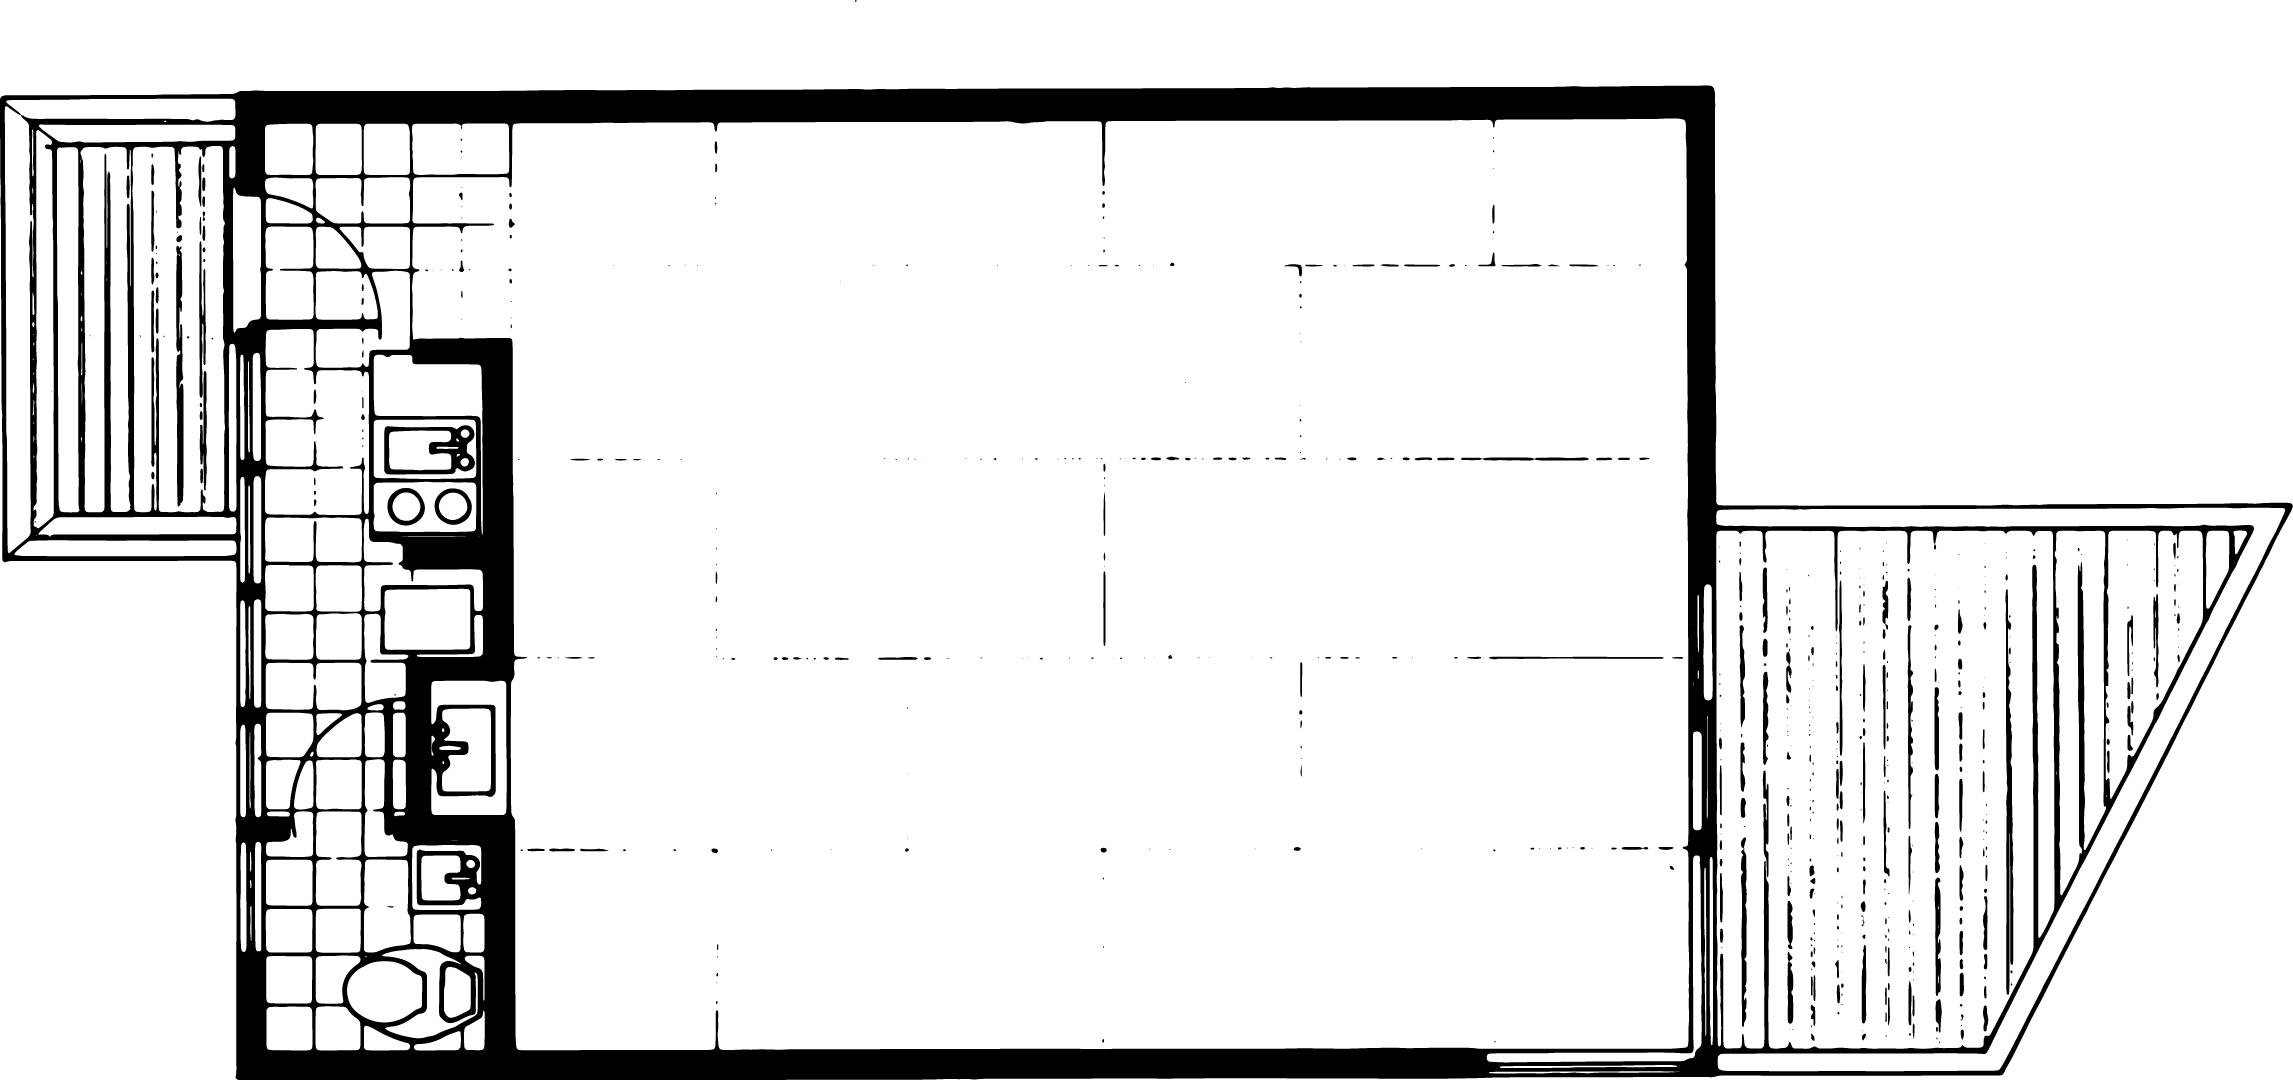 The Thom Studio Floorplan